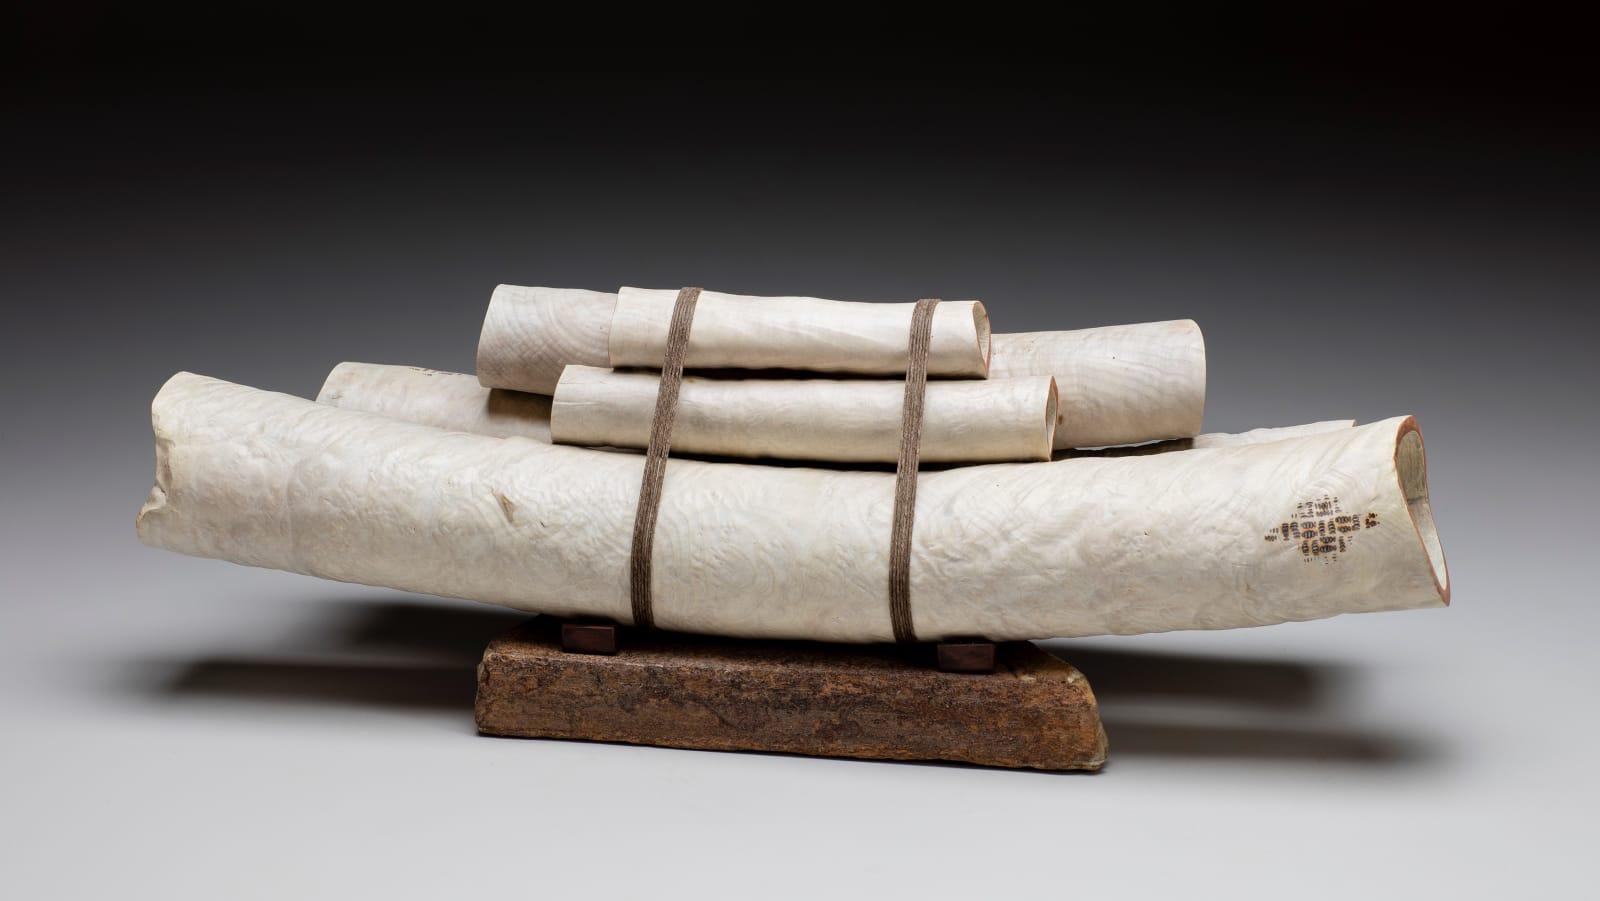 Christian Burchard, Five Scrolls